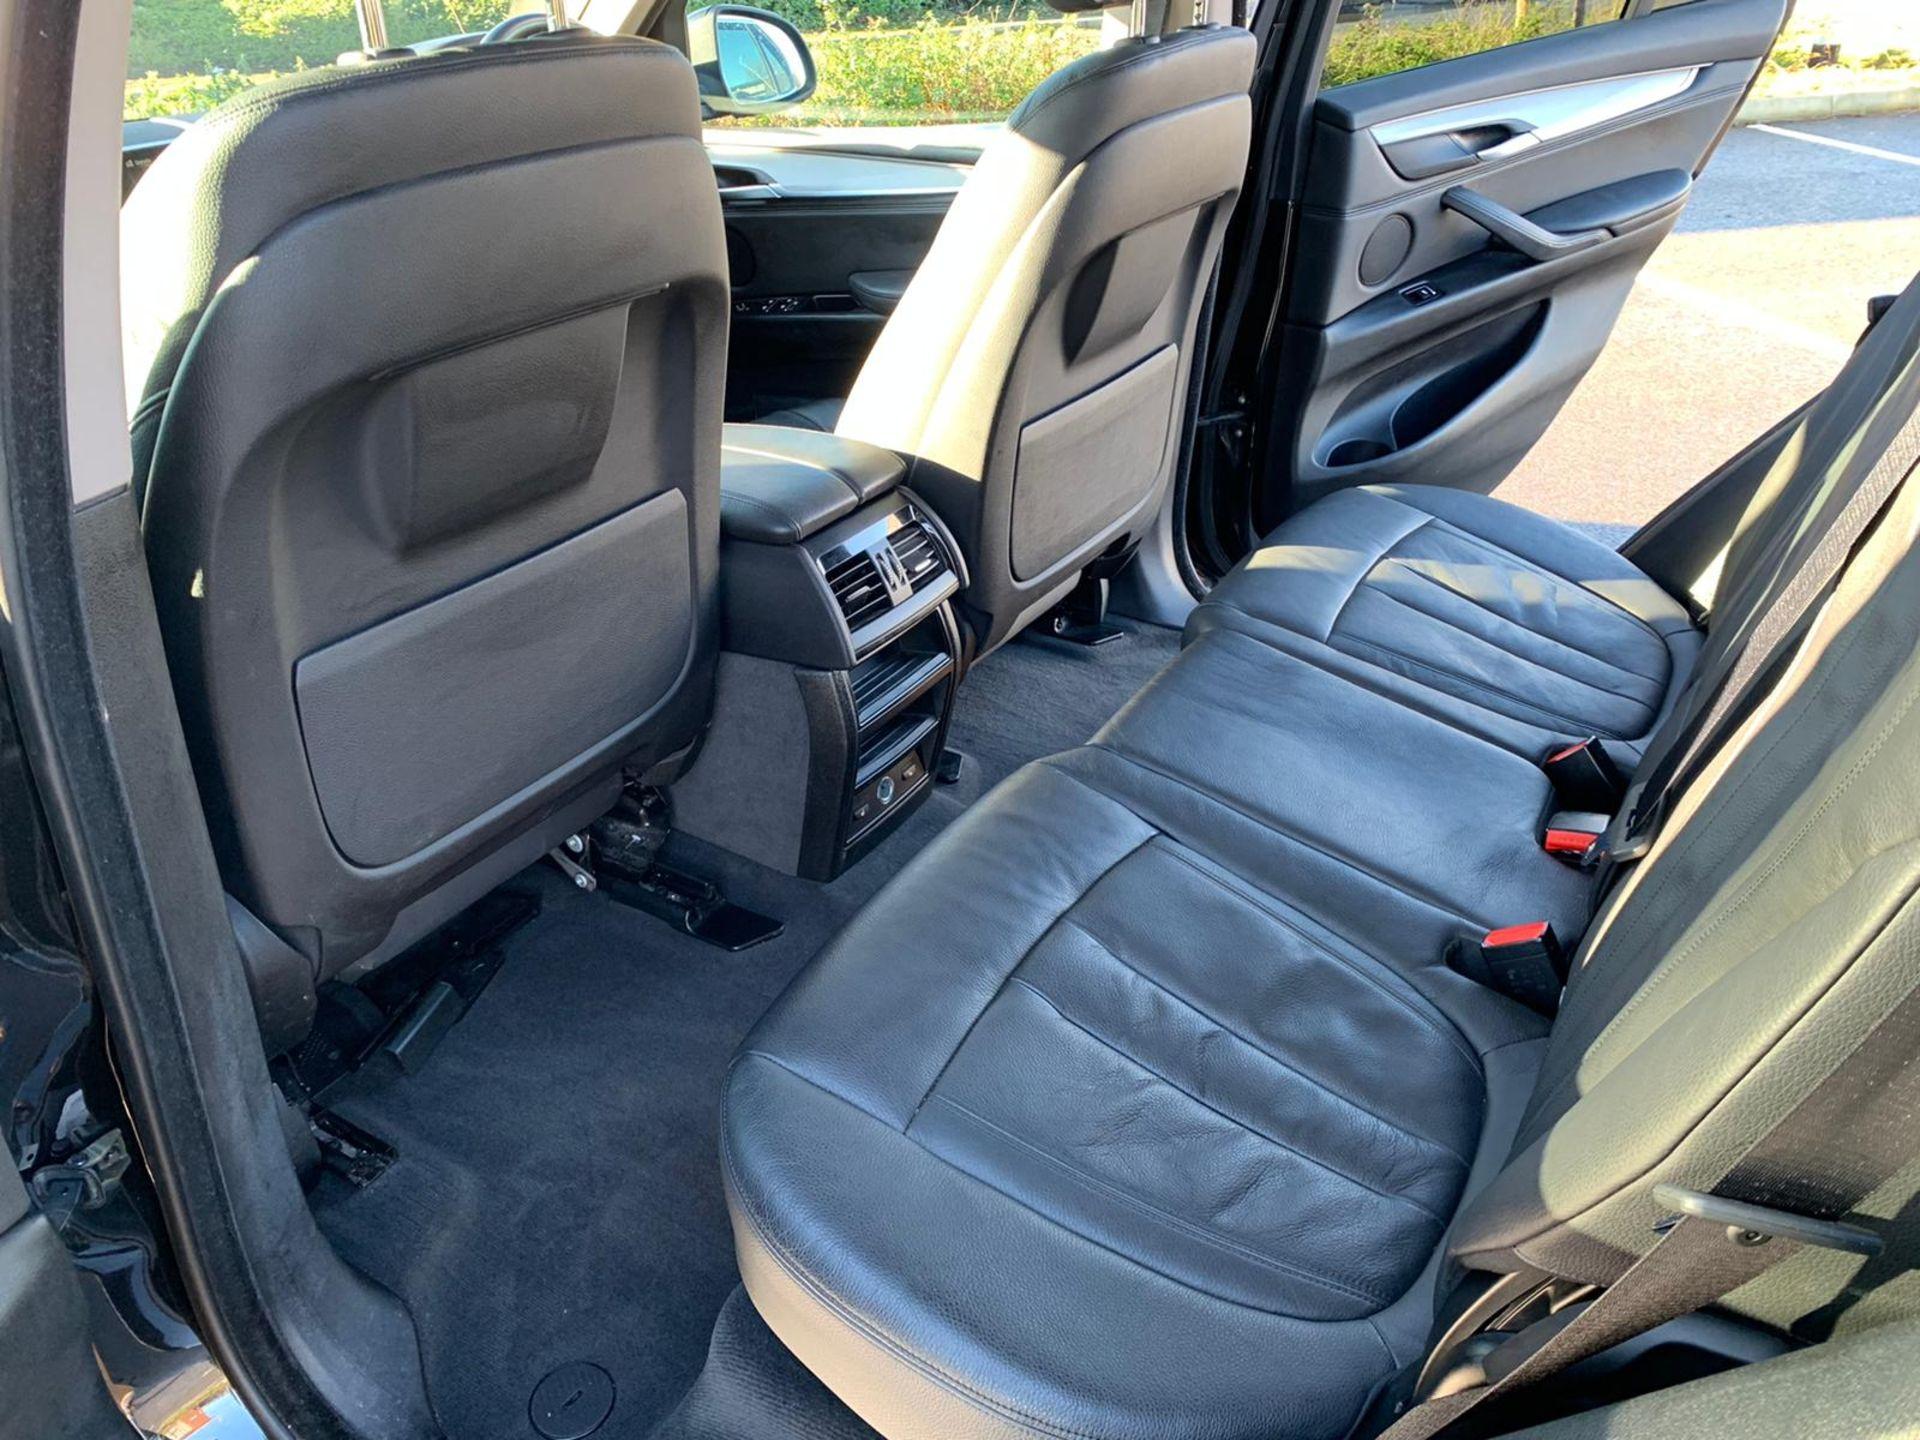 "(Reserve Met) BMW X5 2.0d S-DRIVE ""Special Equipment"" Auto- 7 Seater -16 Reg - Sat Nav- (New Shape) - Image 27 of 43"